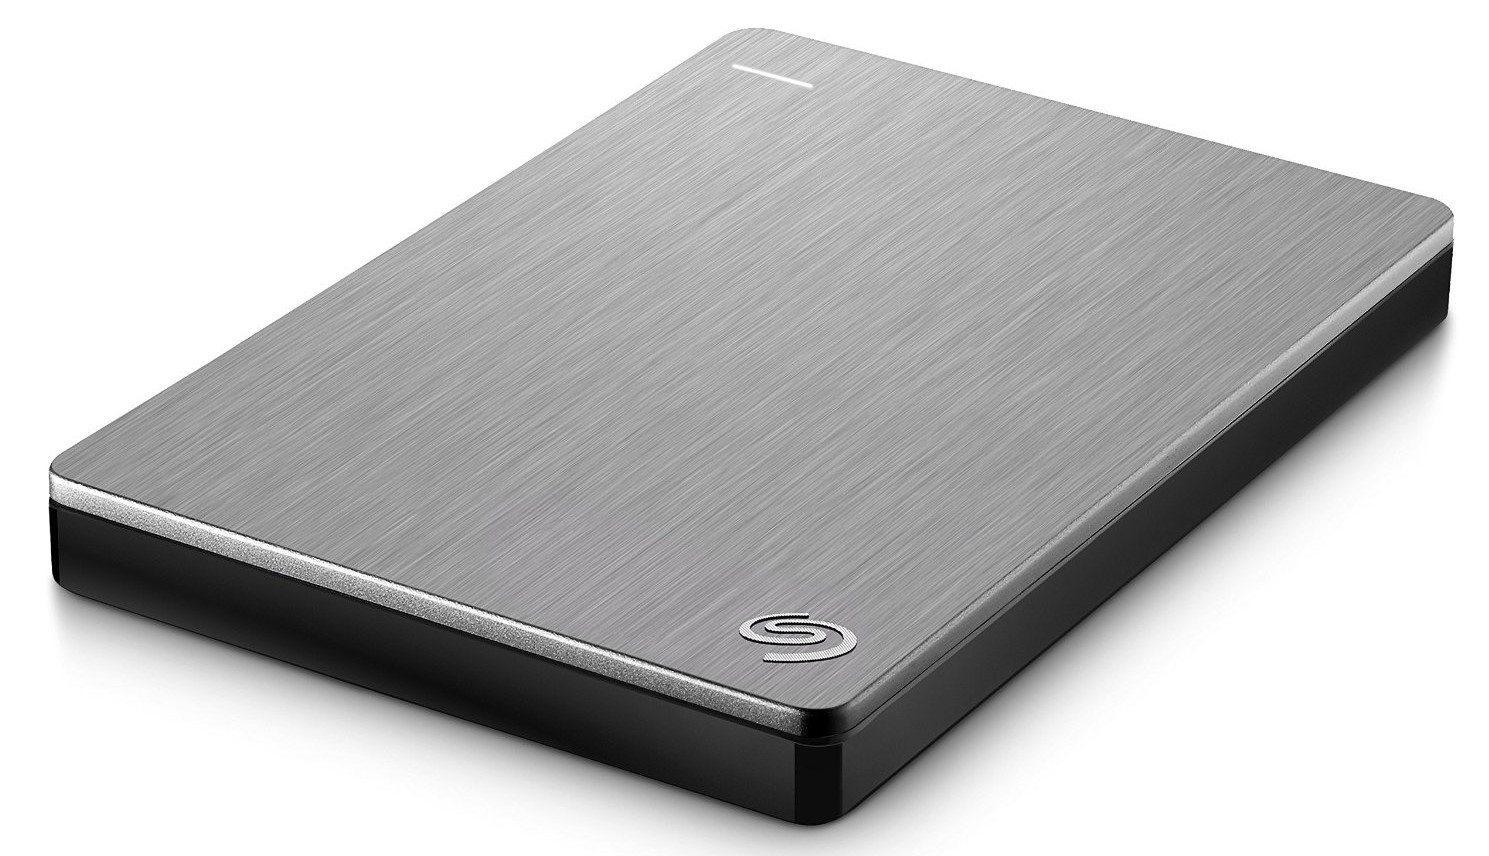 Seagate STDR2000201 - Disco duro externo